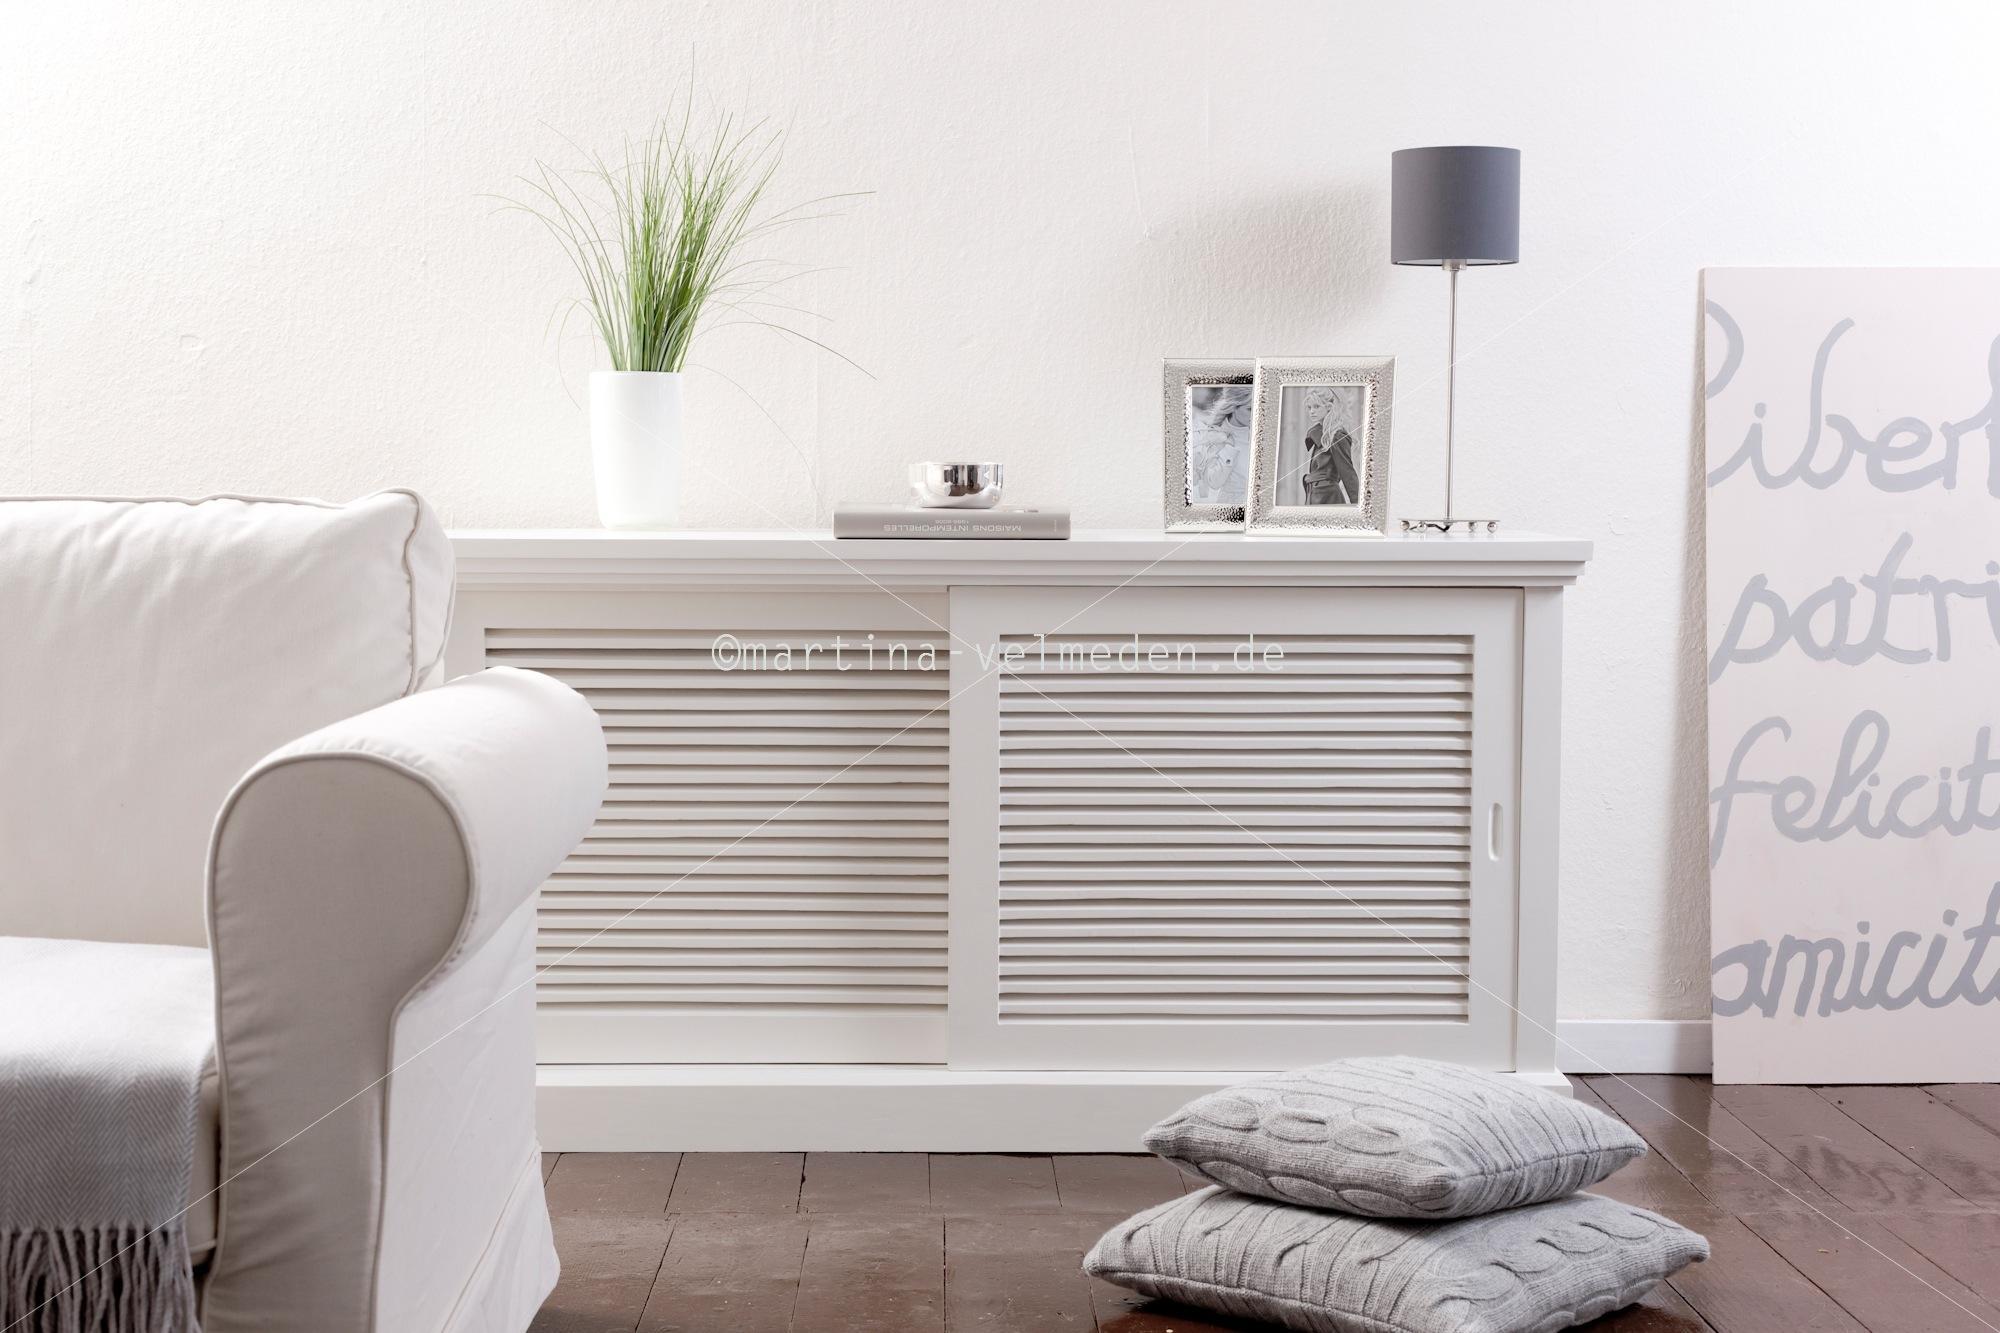 wei e konsole bilder ideen couchstyle. Black Bedroom Furniture Sets. Home Design Ideas